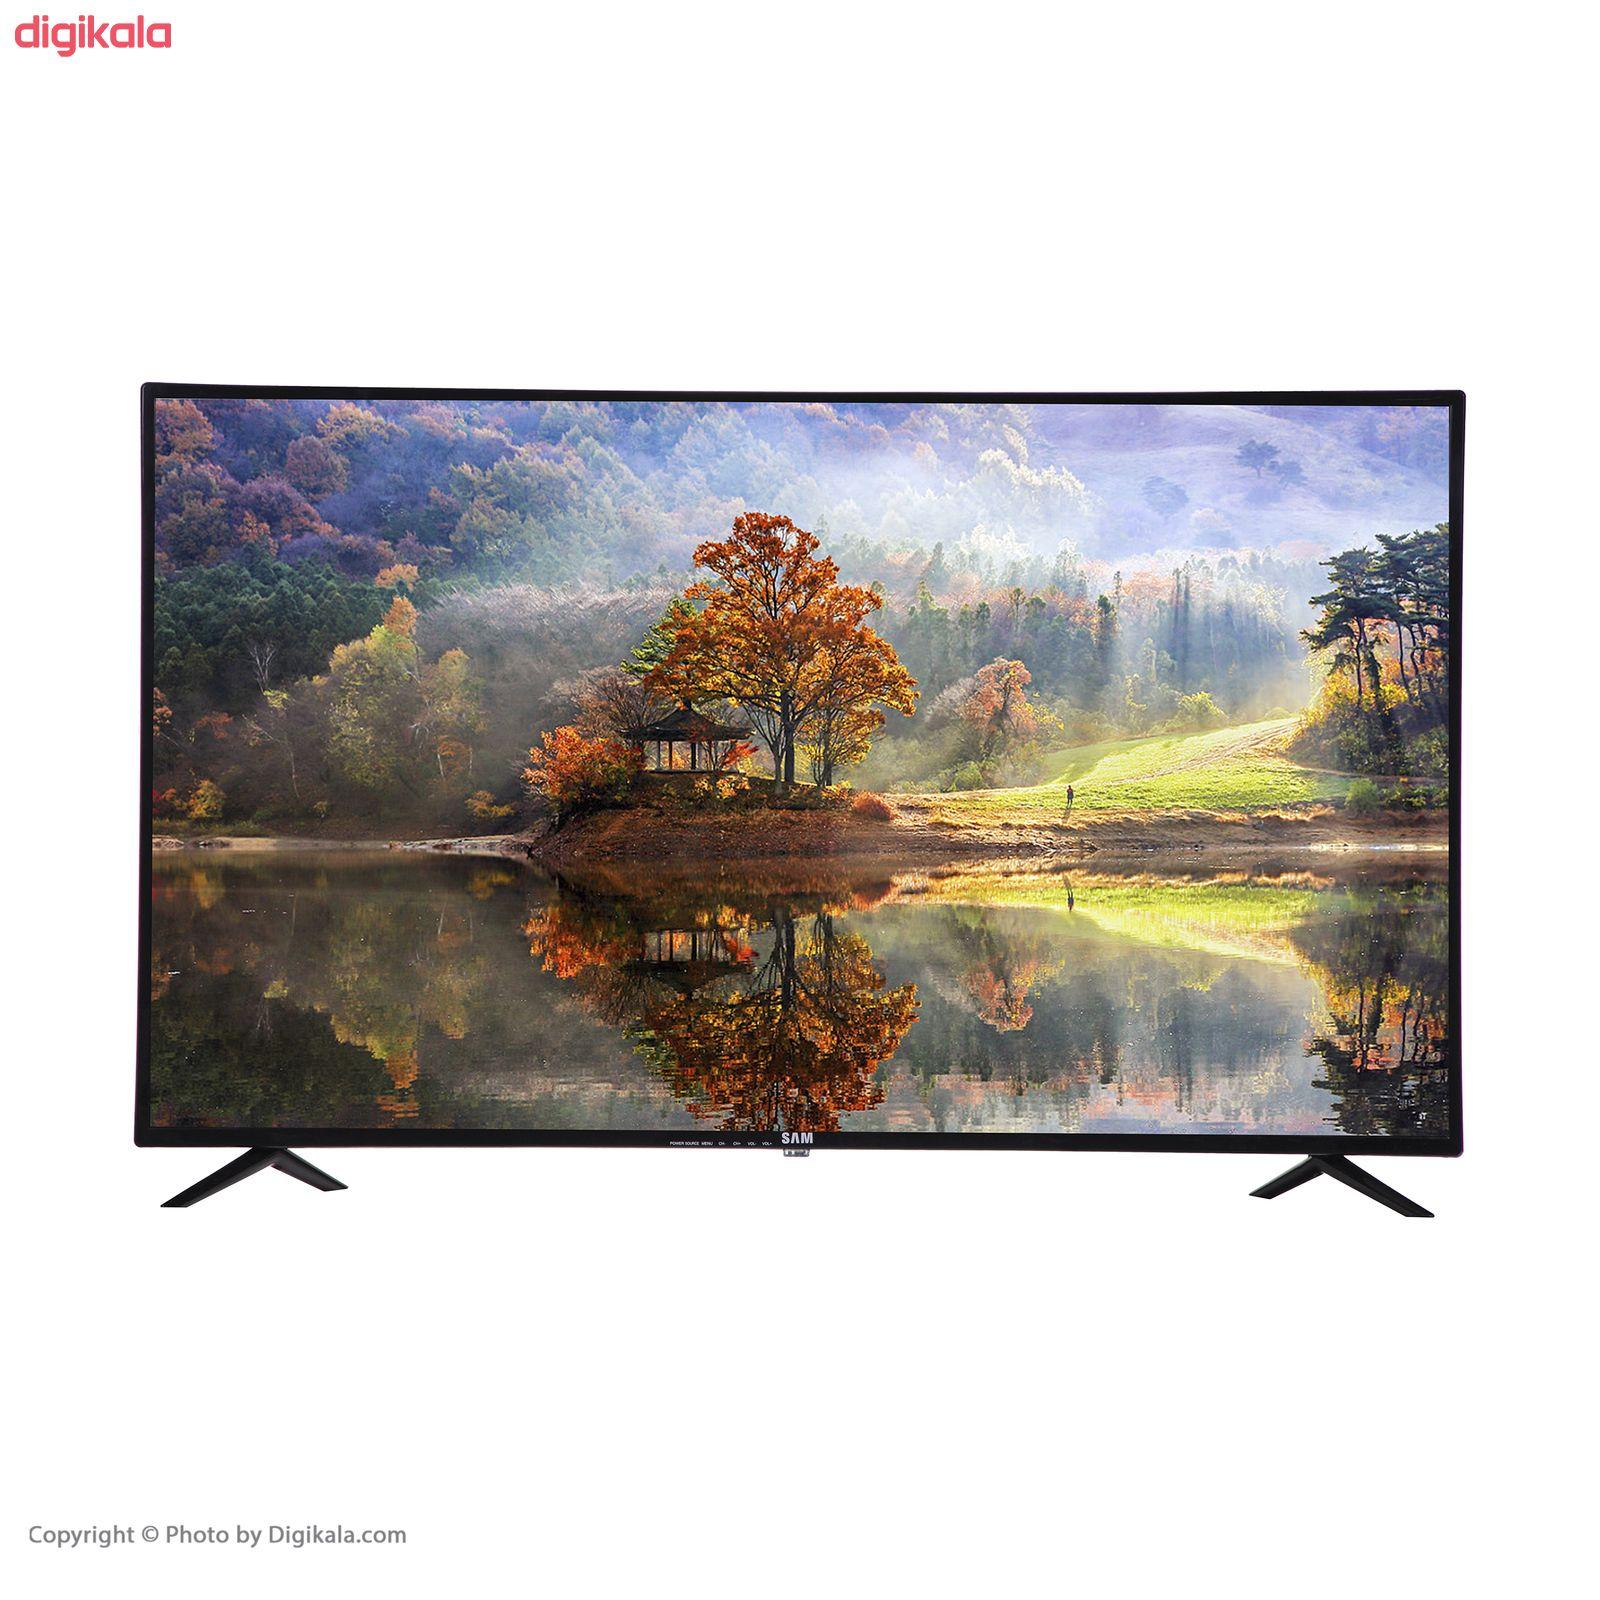 تلویزیون ال ای دی هوشمند سام الکترونیک مدل UA43T5500TH سایز ۴۳ اینچ main 1 1